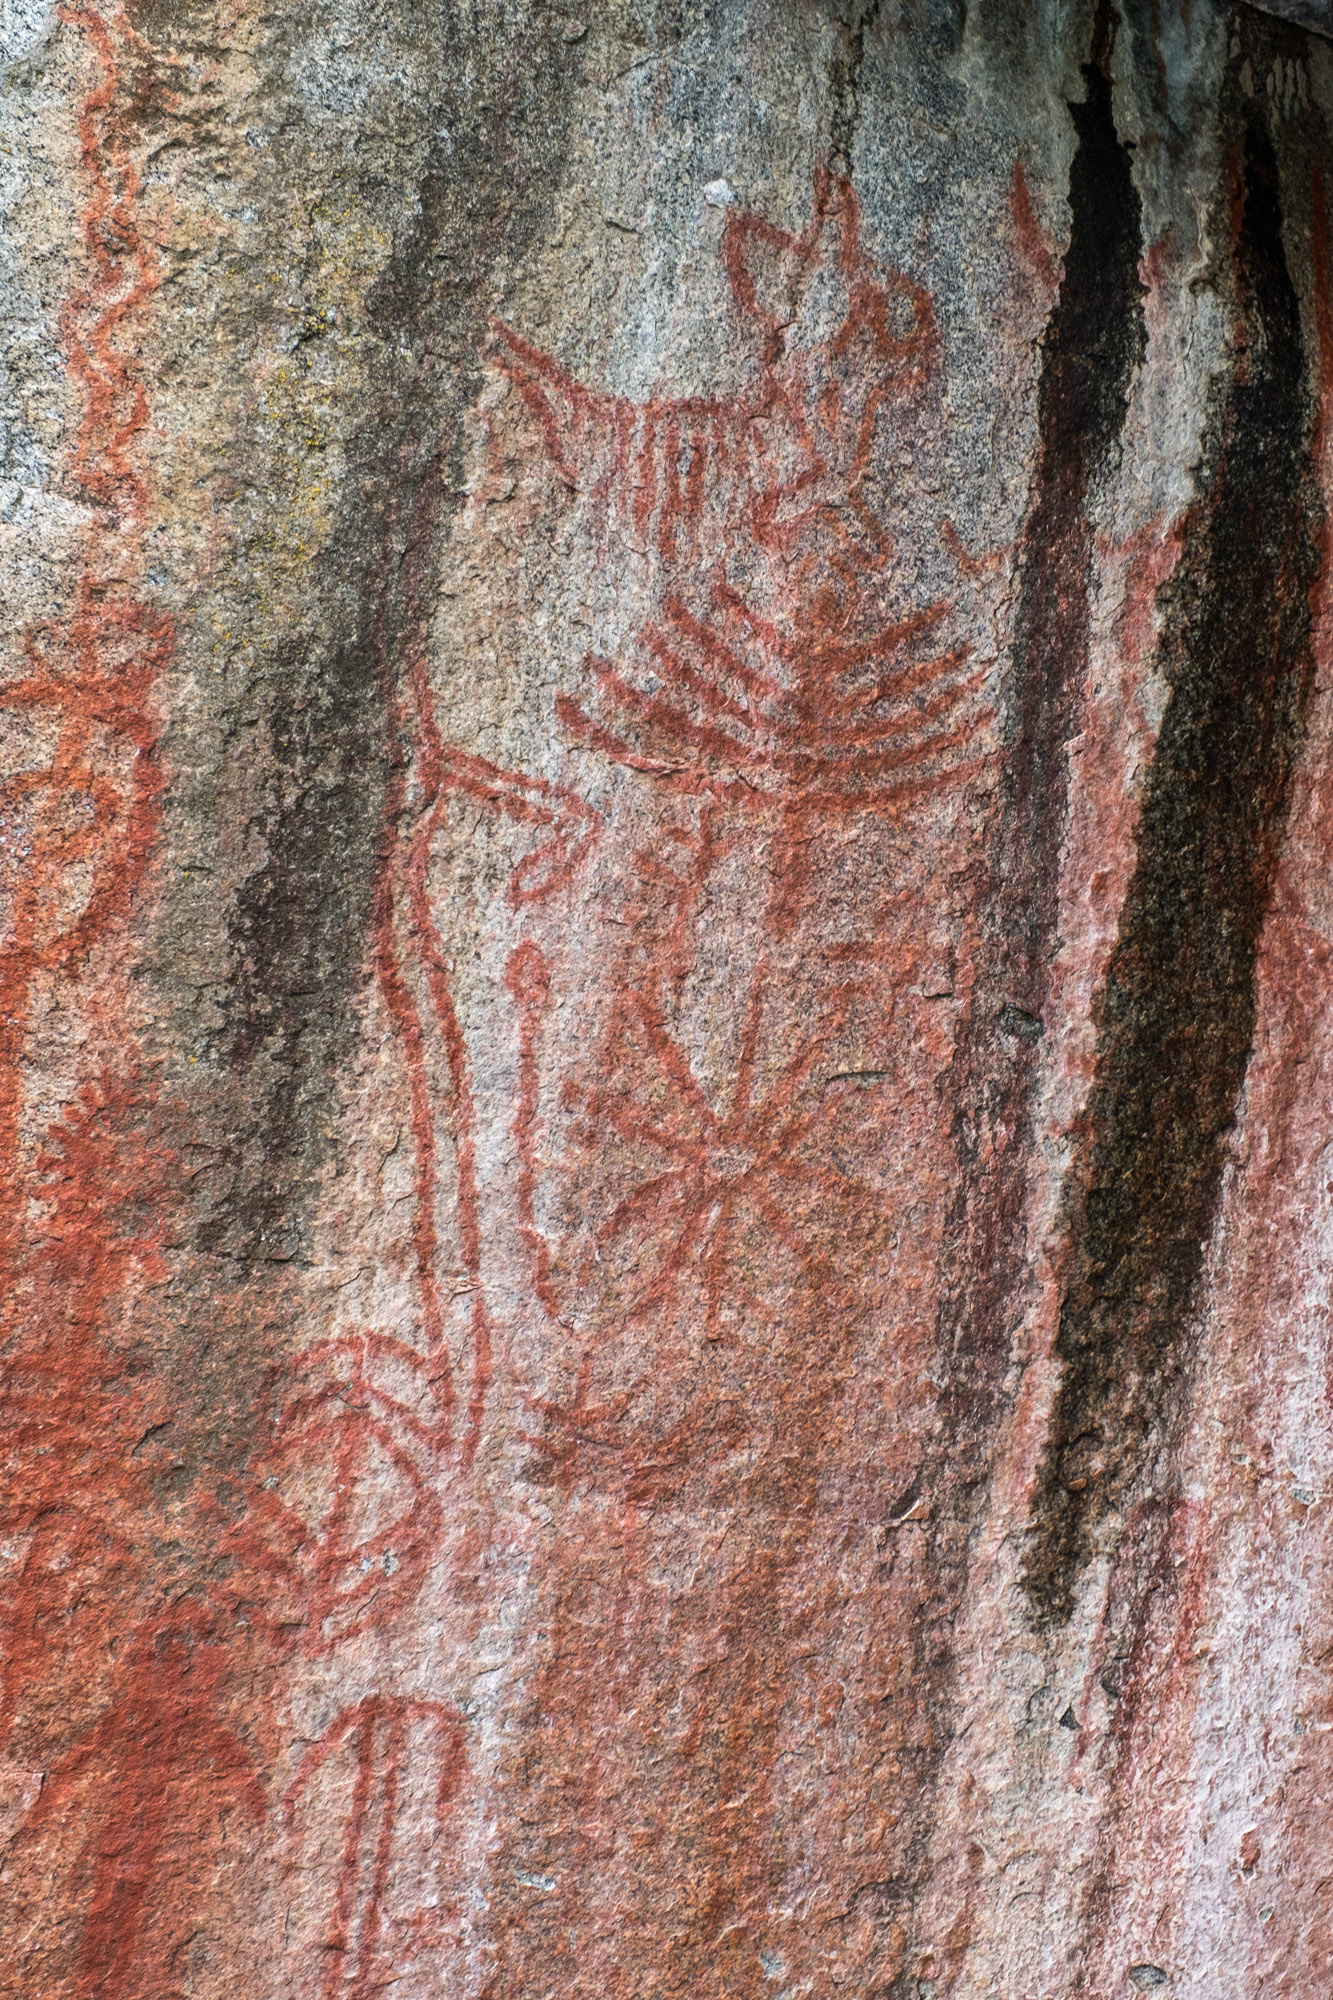 Petroglyphs at Hospital Rock.